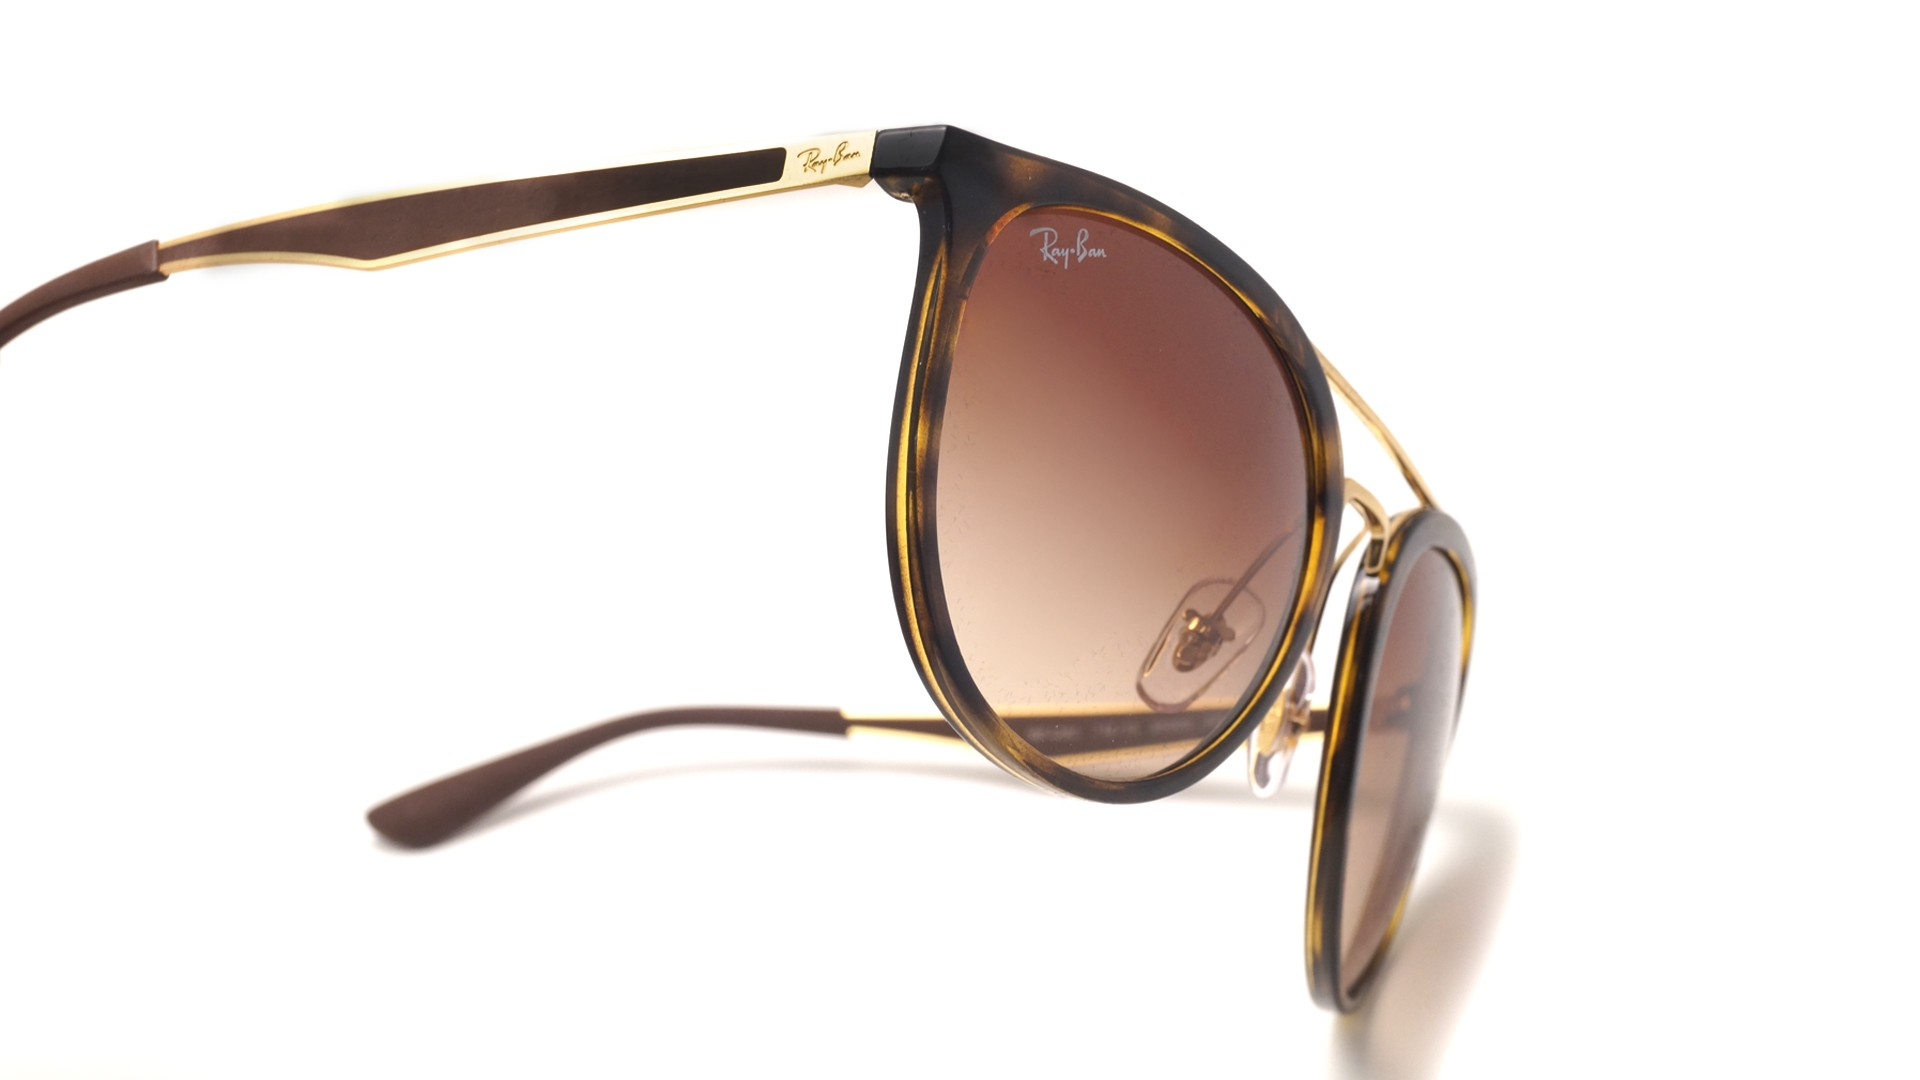 78b53a6e7b Sunglasses Ray-Ban RB4285 710 13 55-20 Tortoise Large Gradient